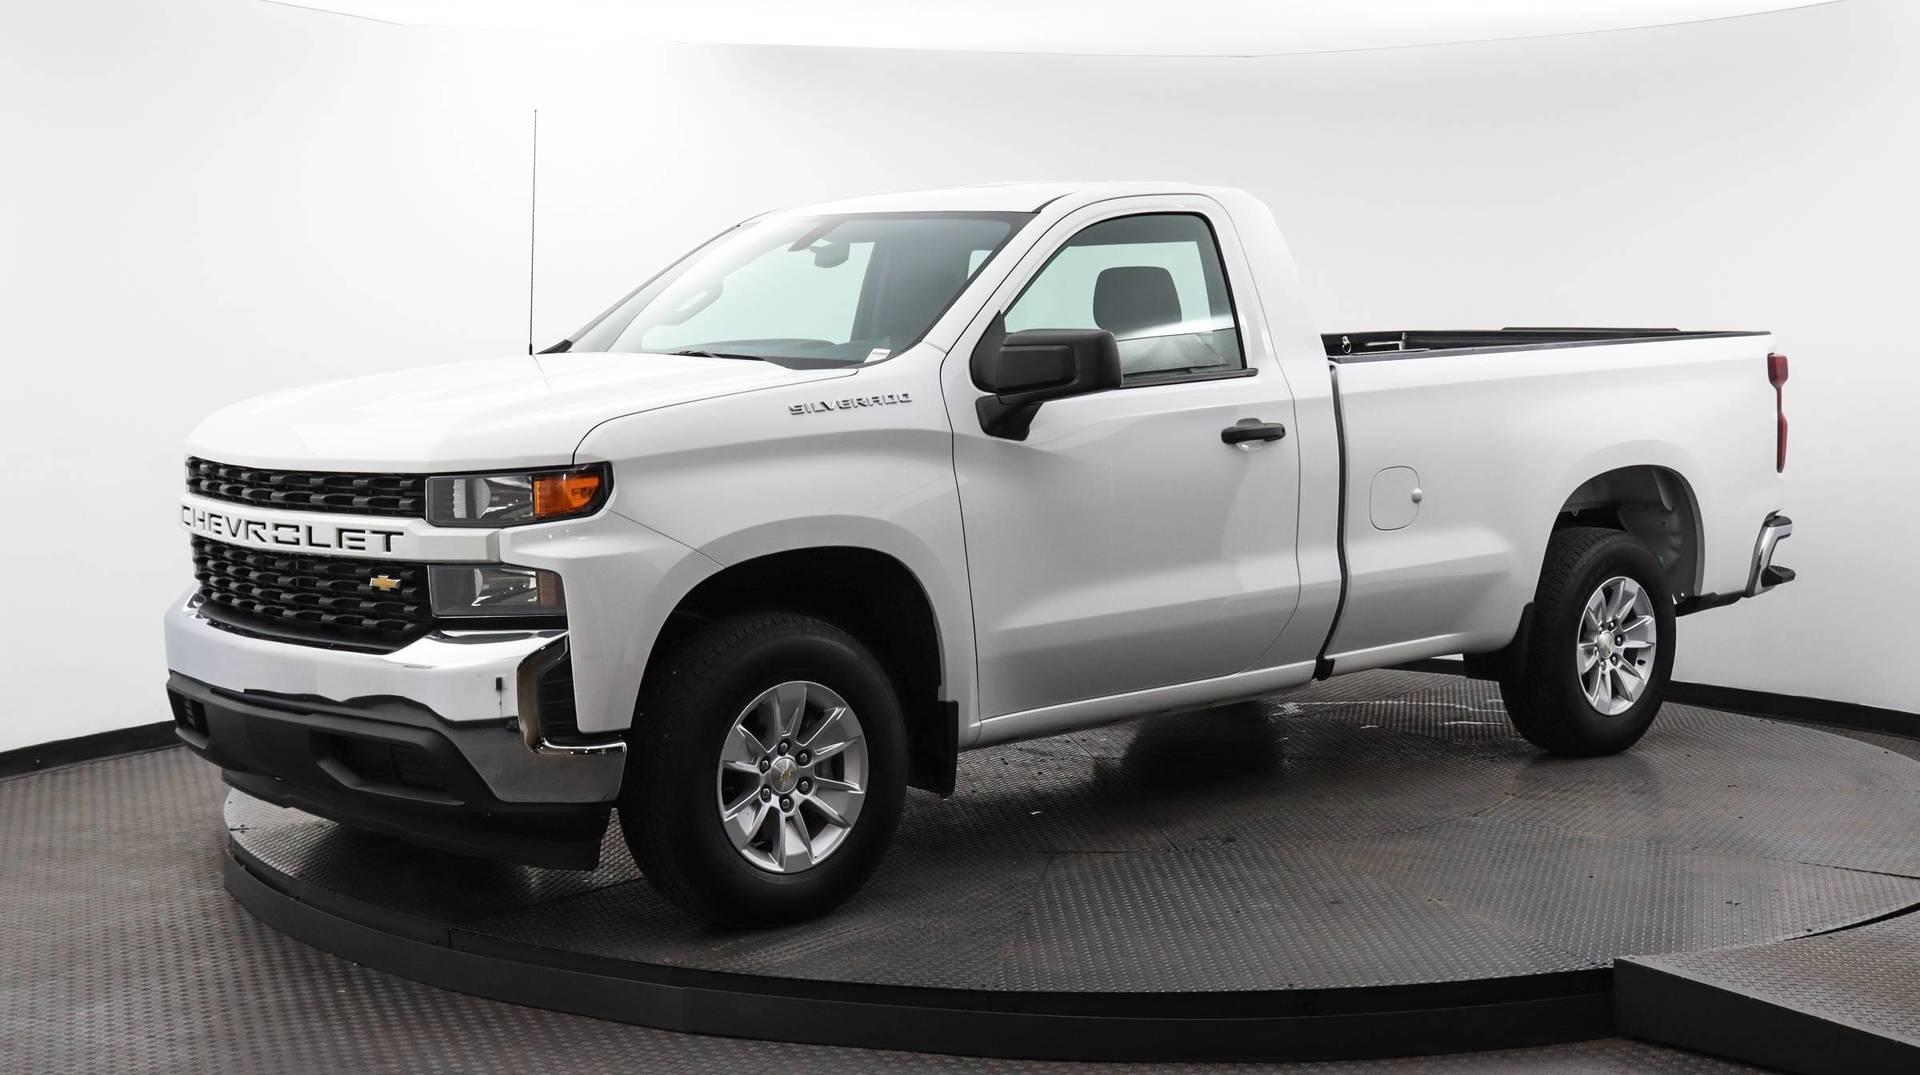 Florida Fine Cars - Used vehicle - Truck CHEVROLET SILVERADO 1500 2020